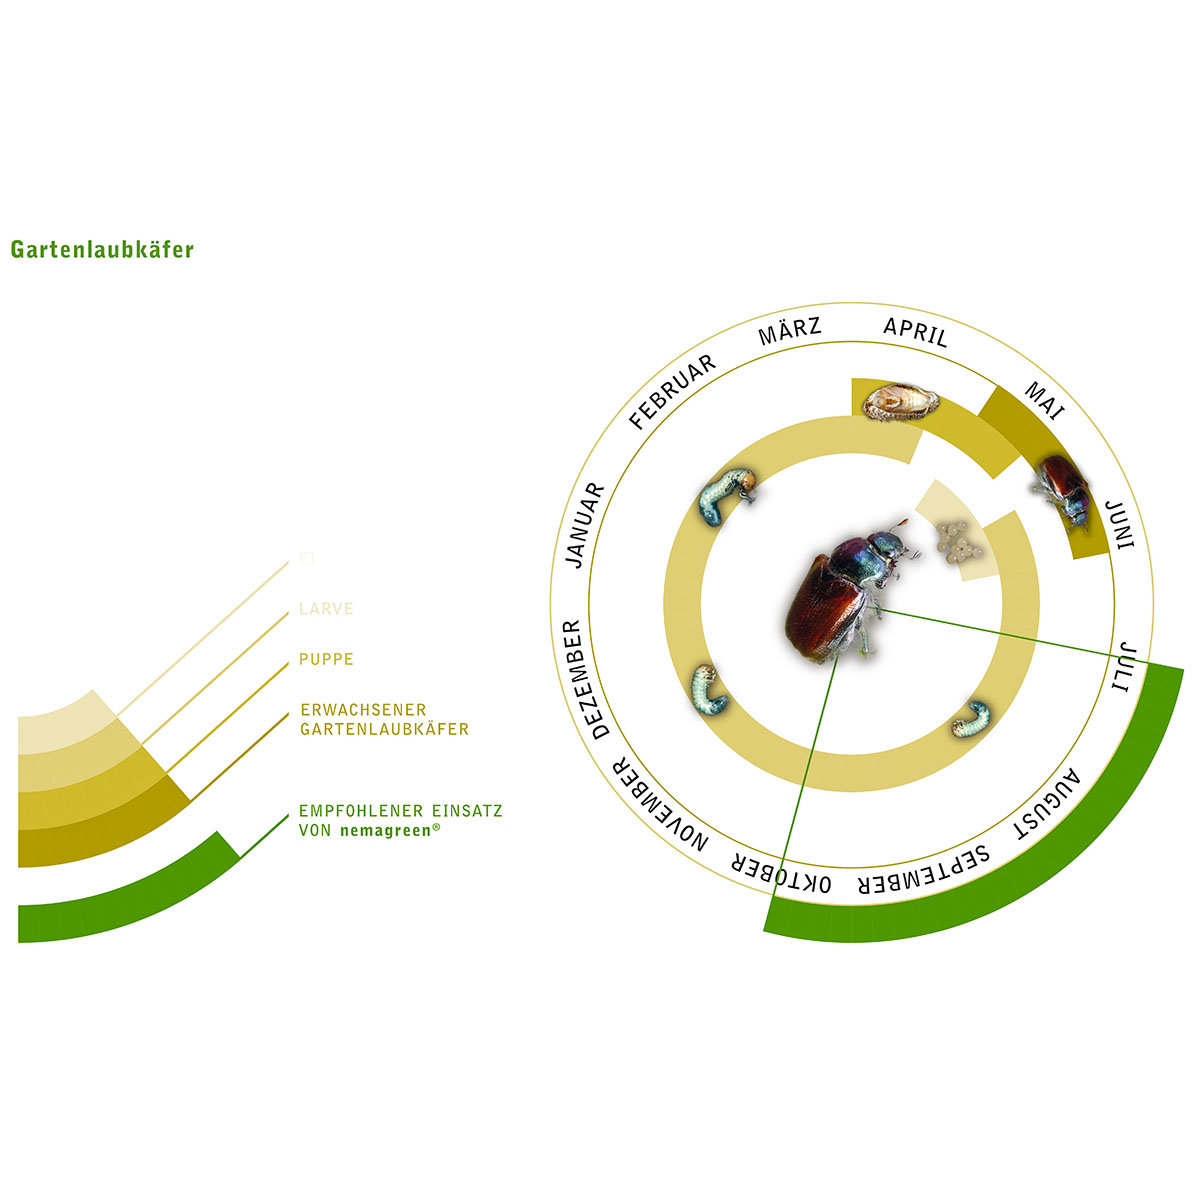 nema-green Nematoden gegen Rasenschädlinge, 50 Mio.   #2